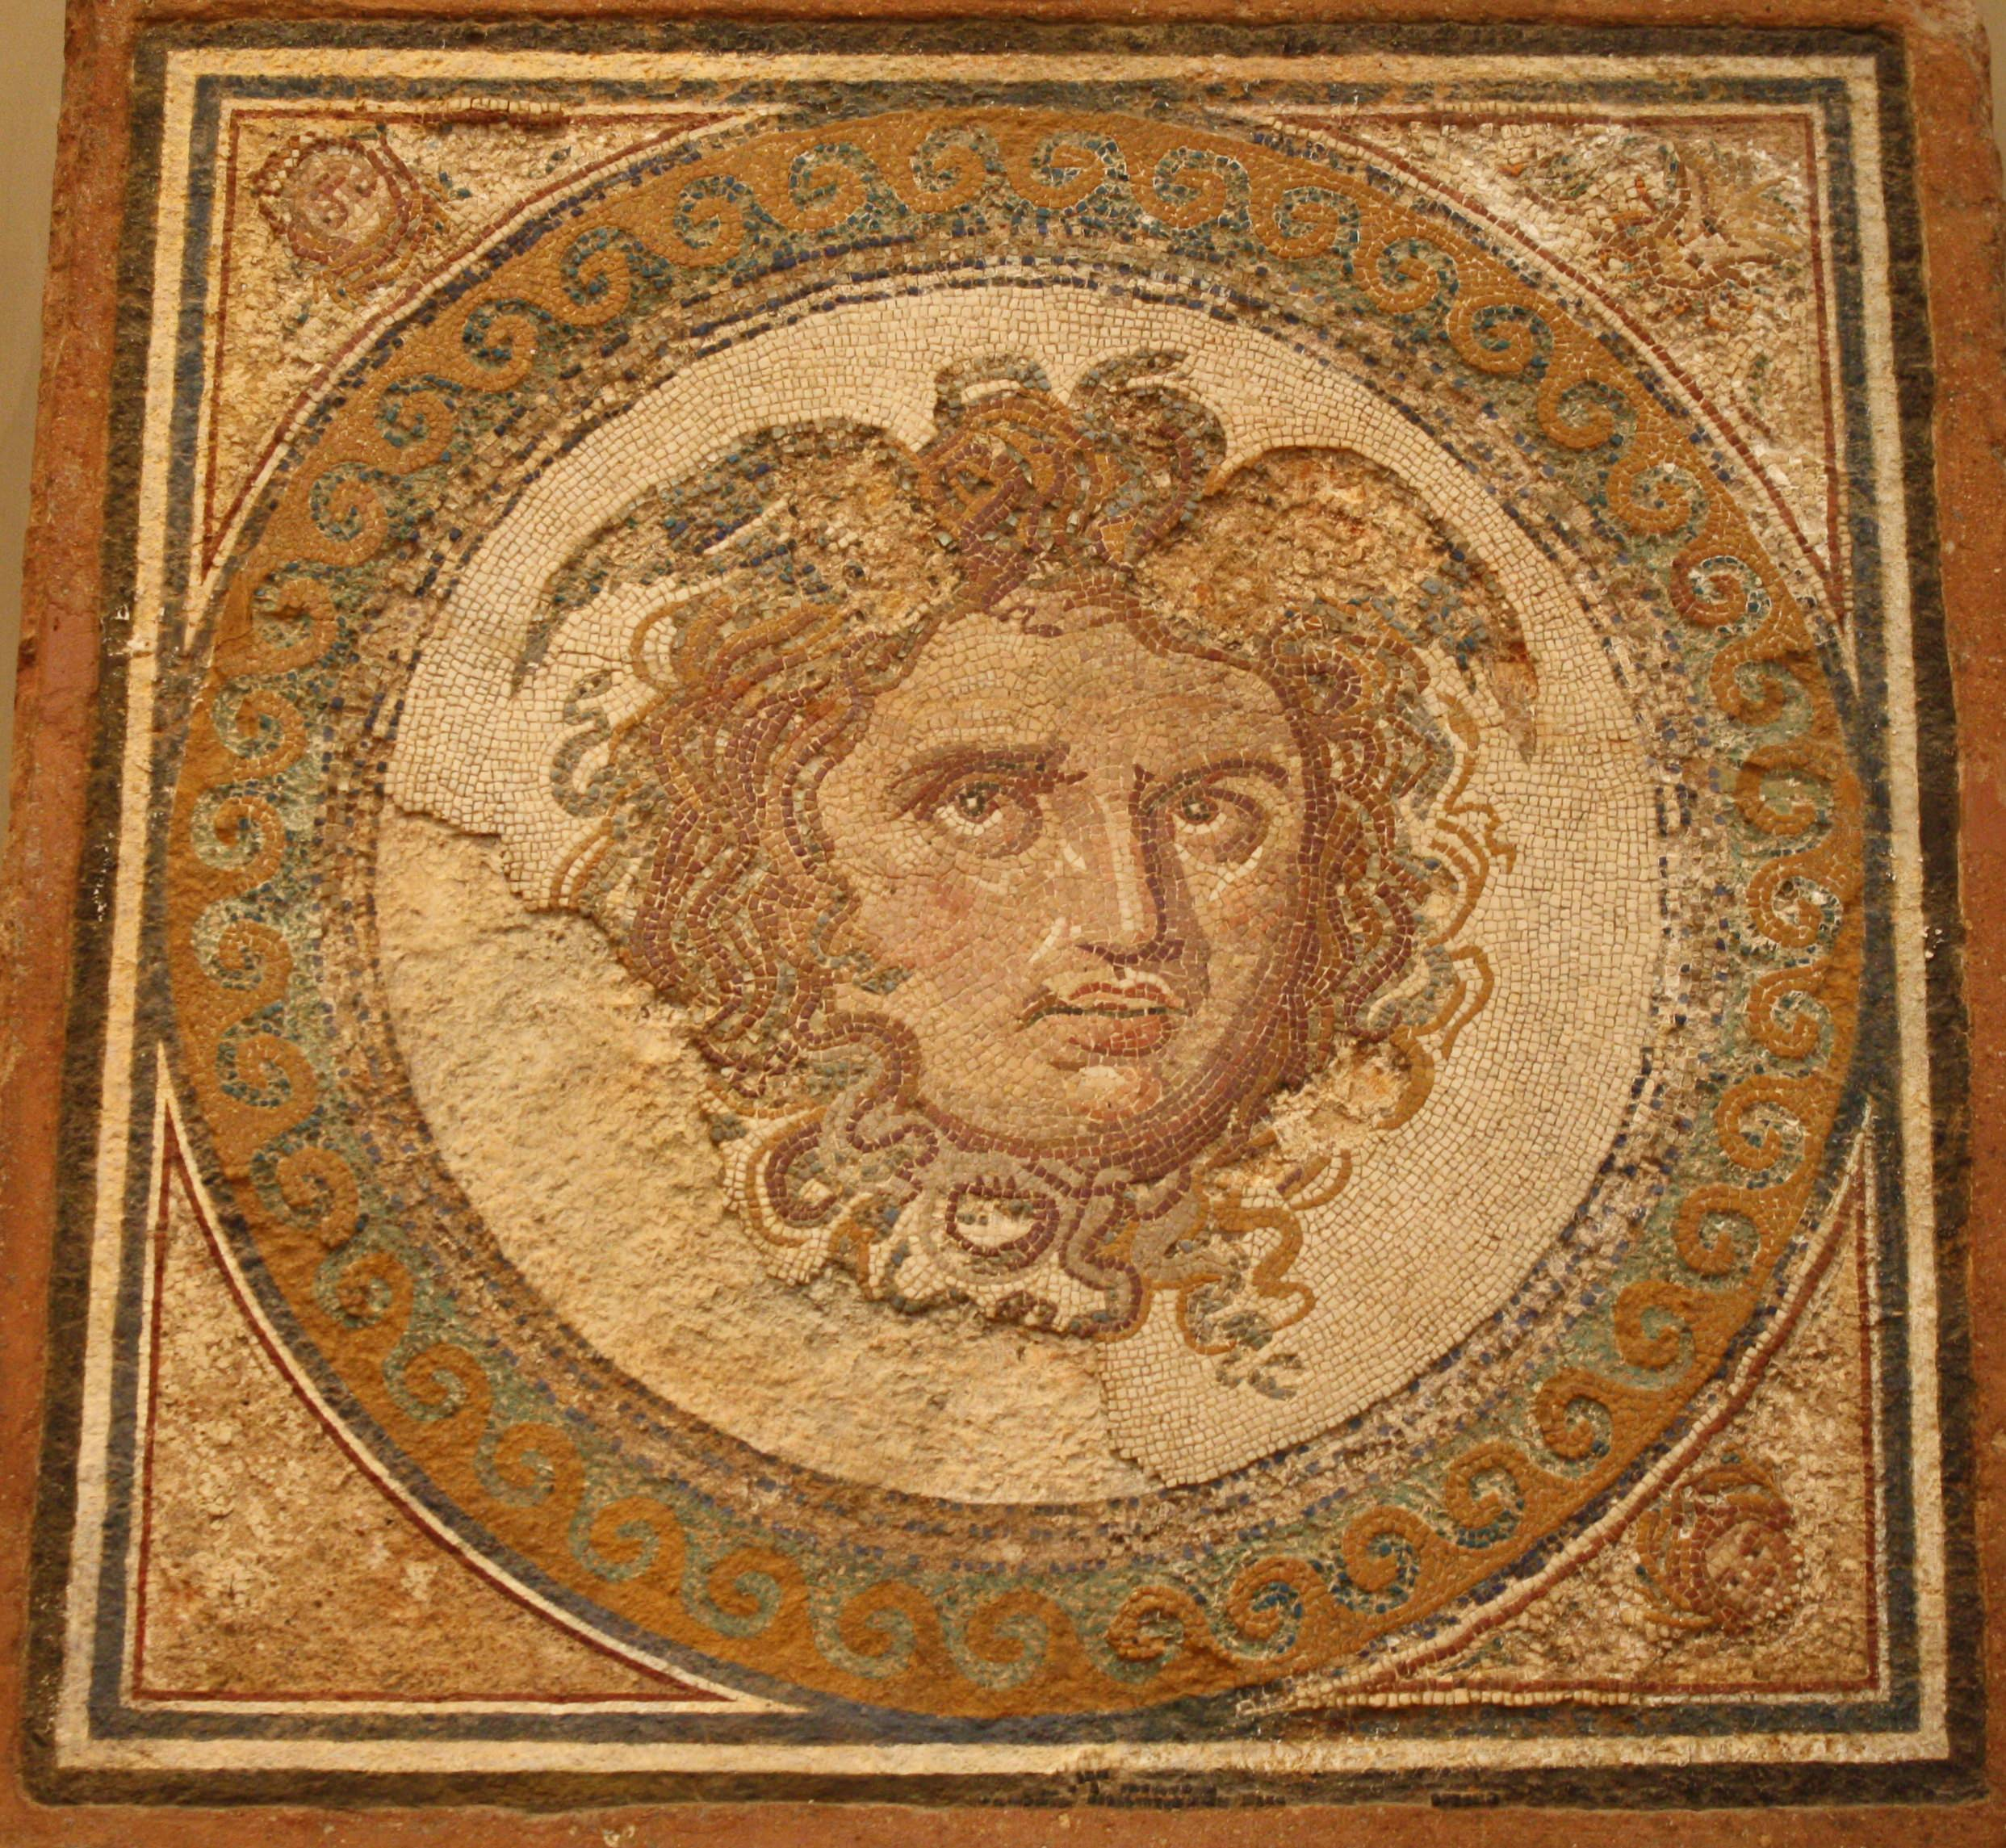 Medusa ancient history encyclopedia medusa mosaic buycottarizona